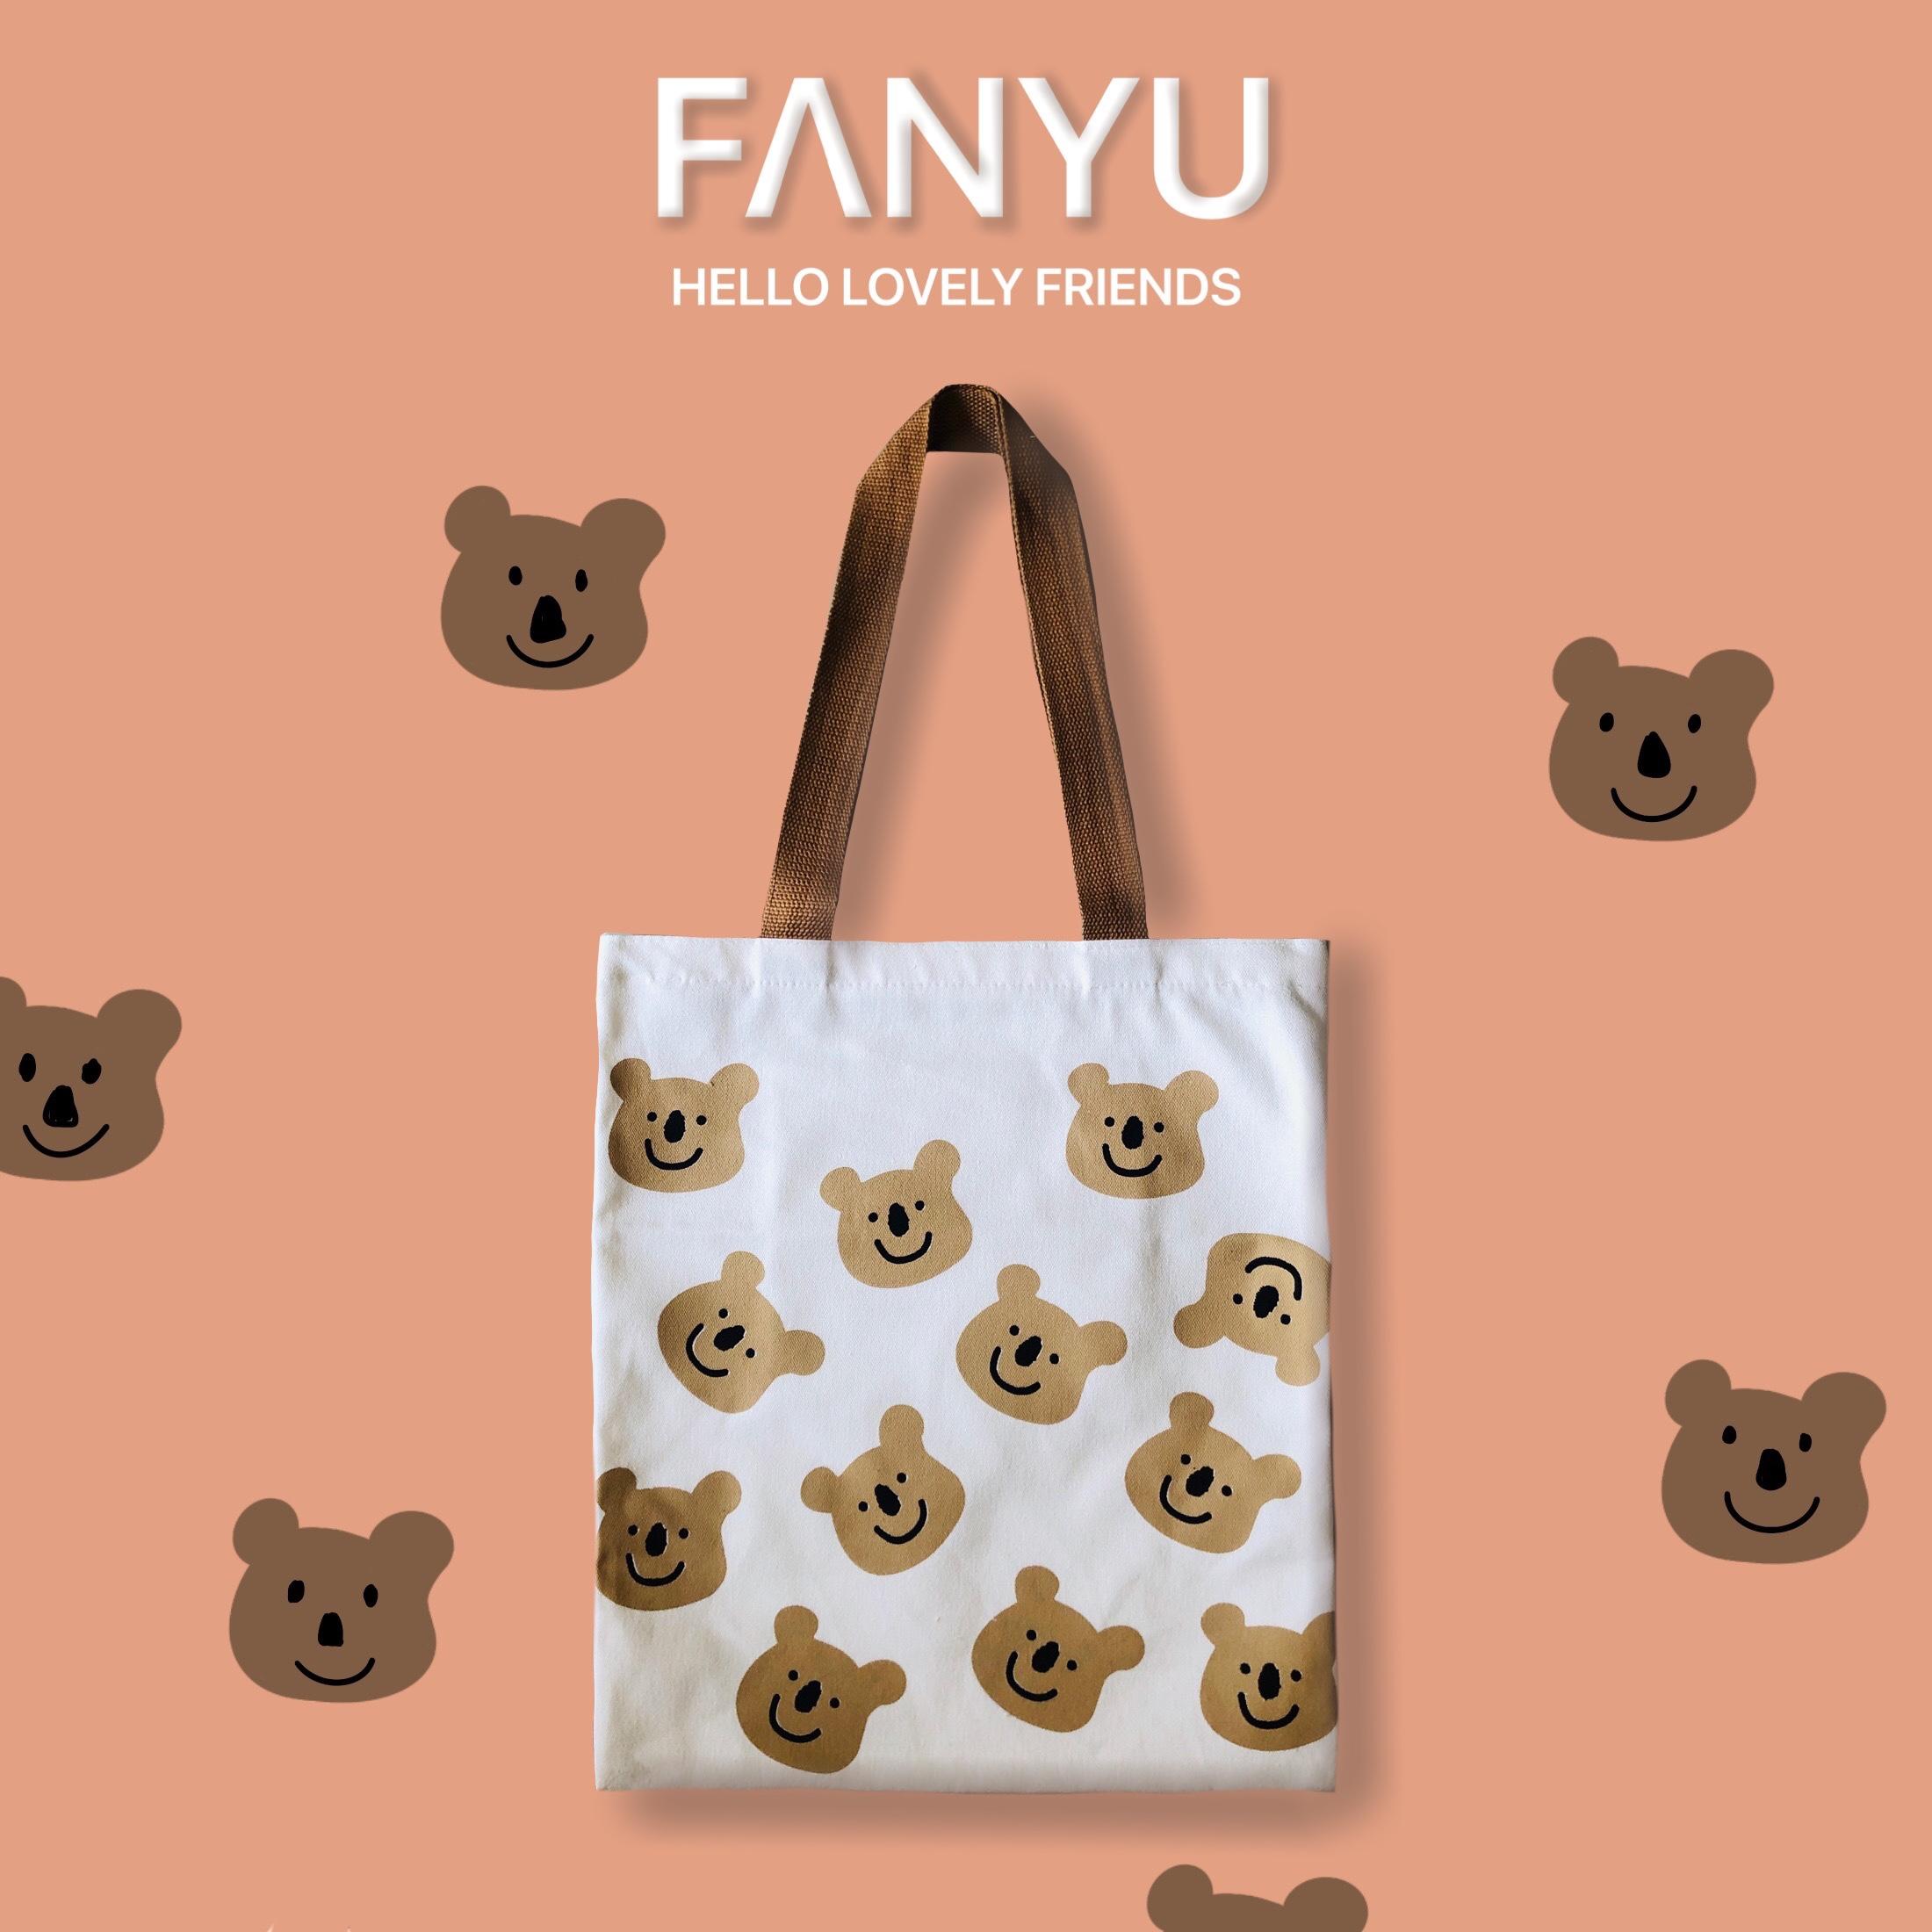 fanyu2020新款ins韩风帆布包女单肩购物袋百搭卡通学生文艺女包